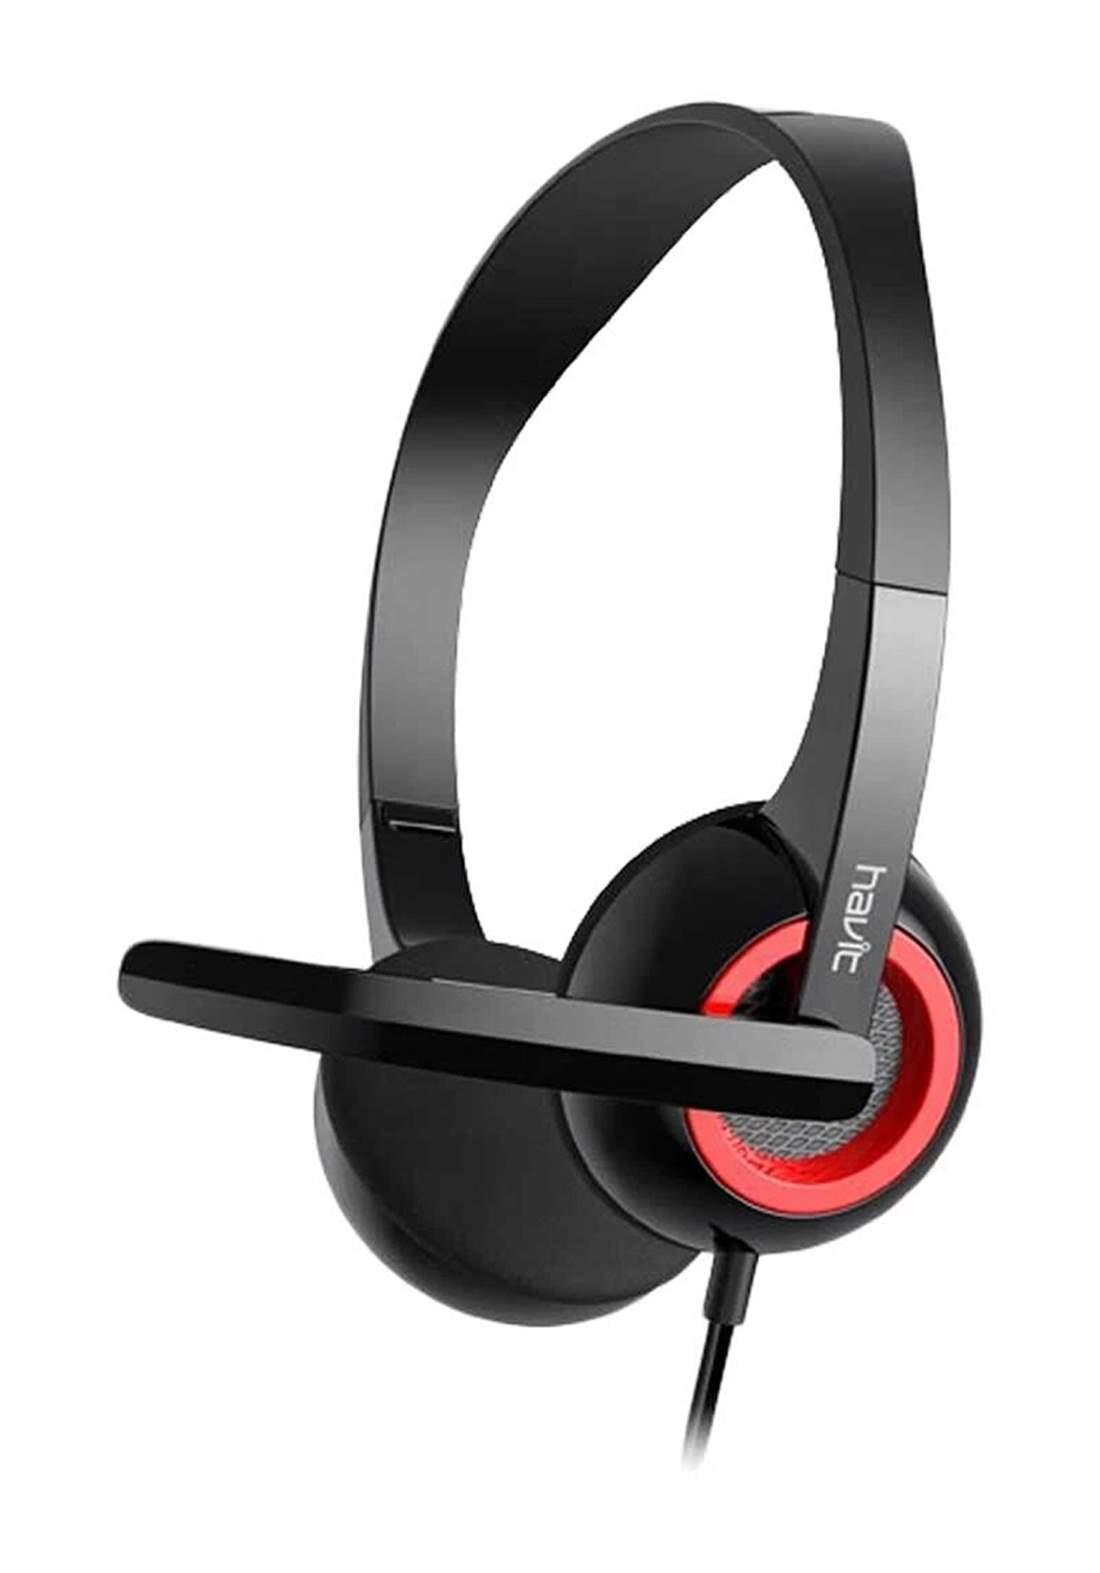 Havit H202d wired Headset - Black